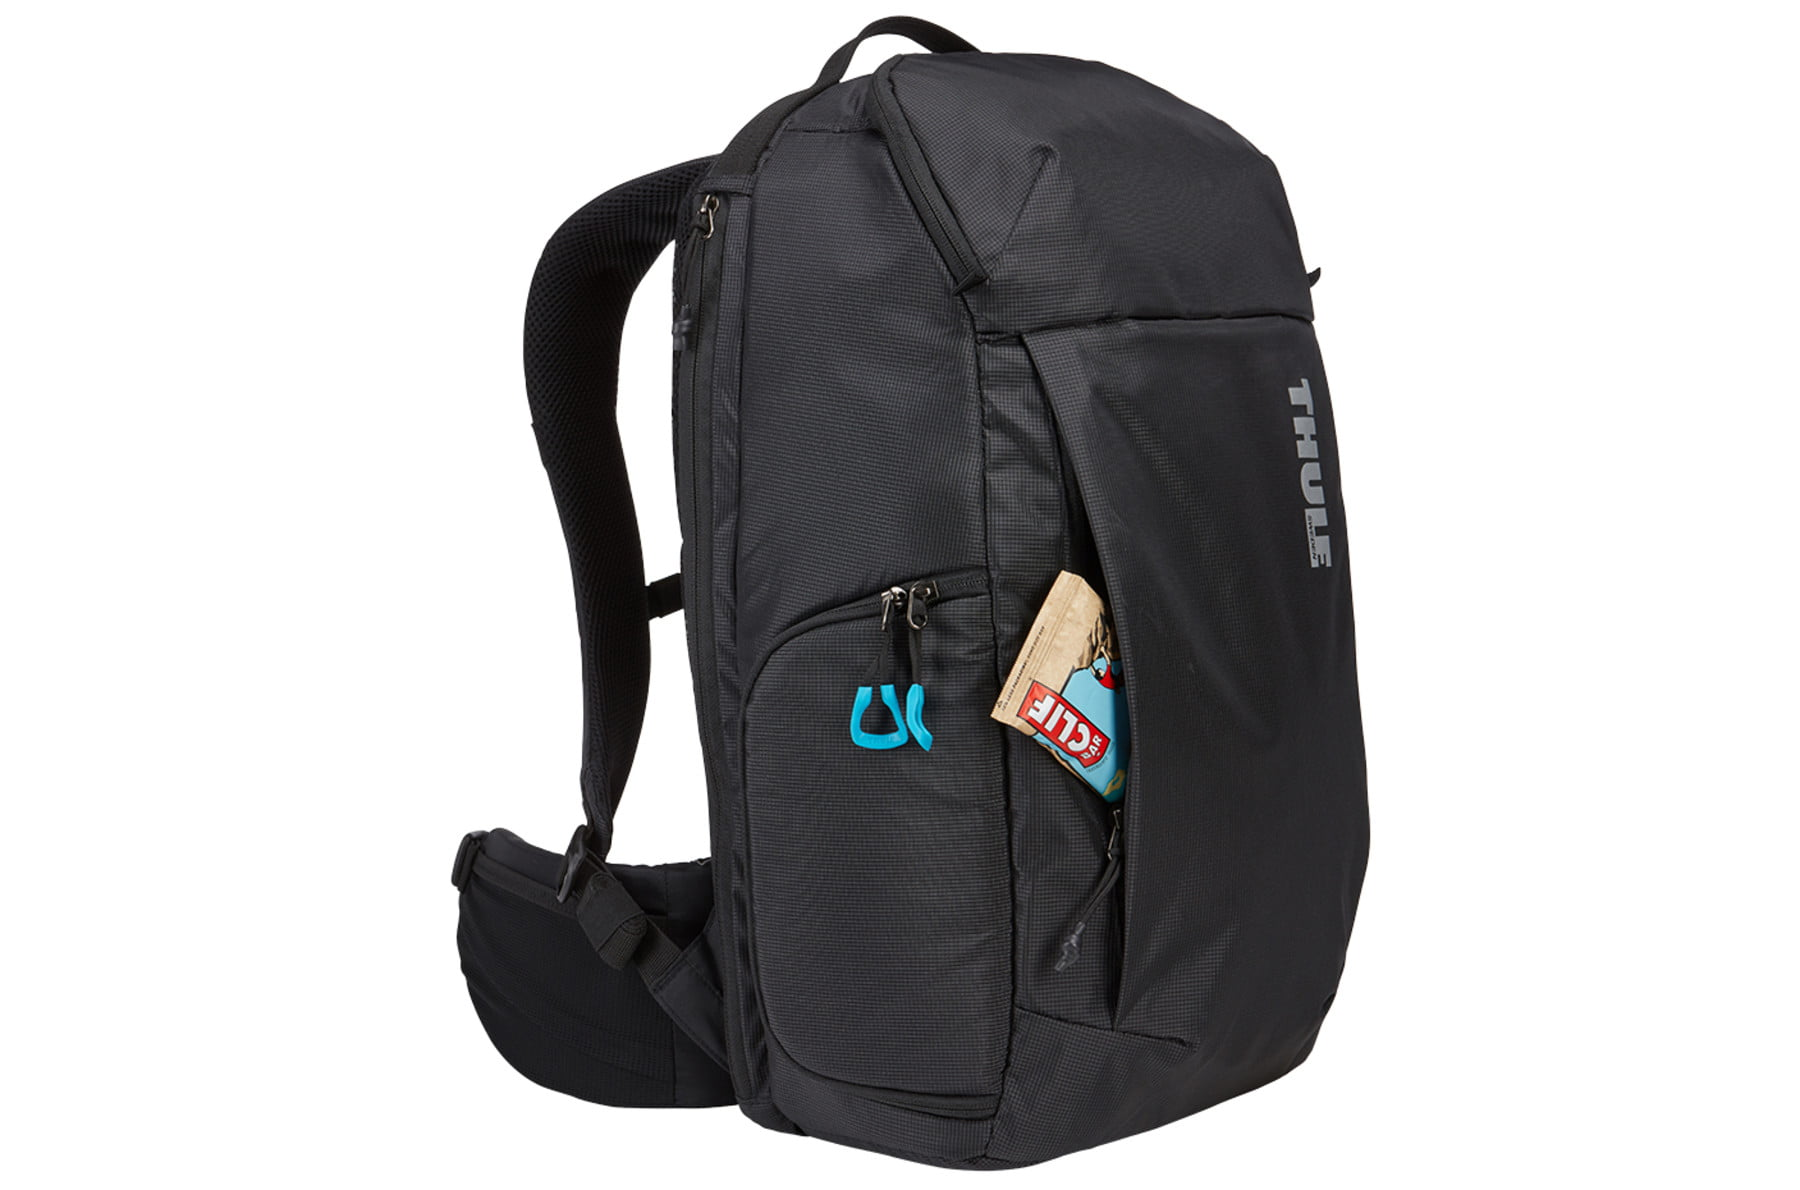 Rucsac foto Thule Aspect DSLR Backpack Negru 9